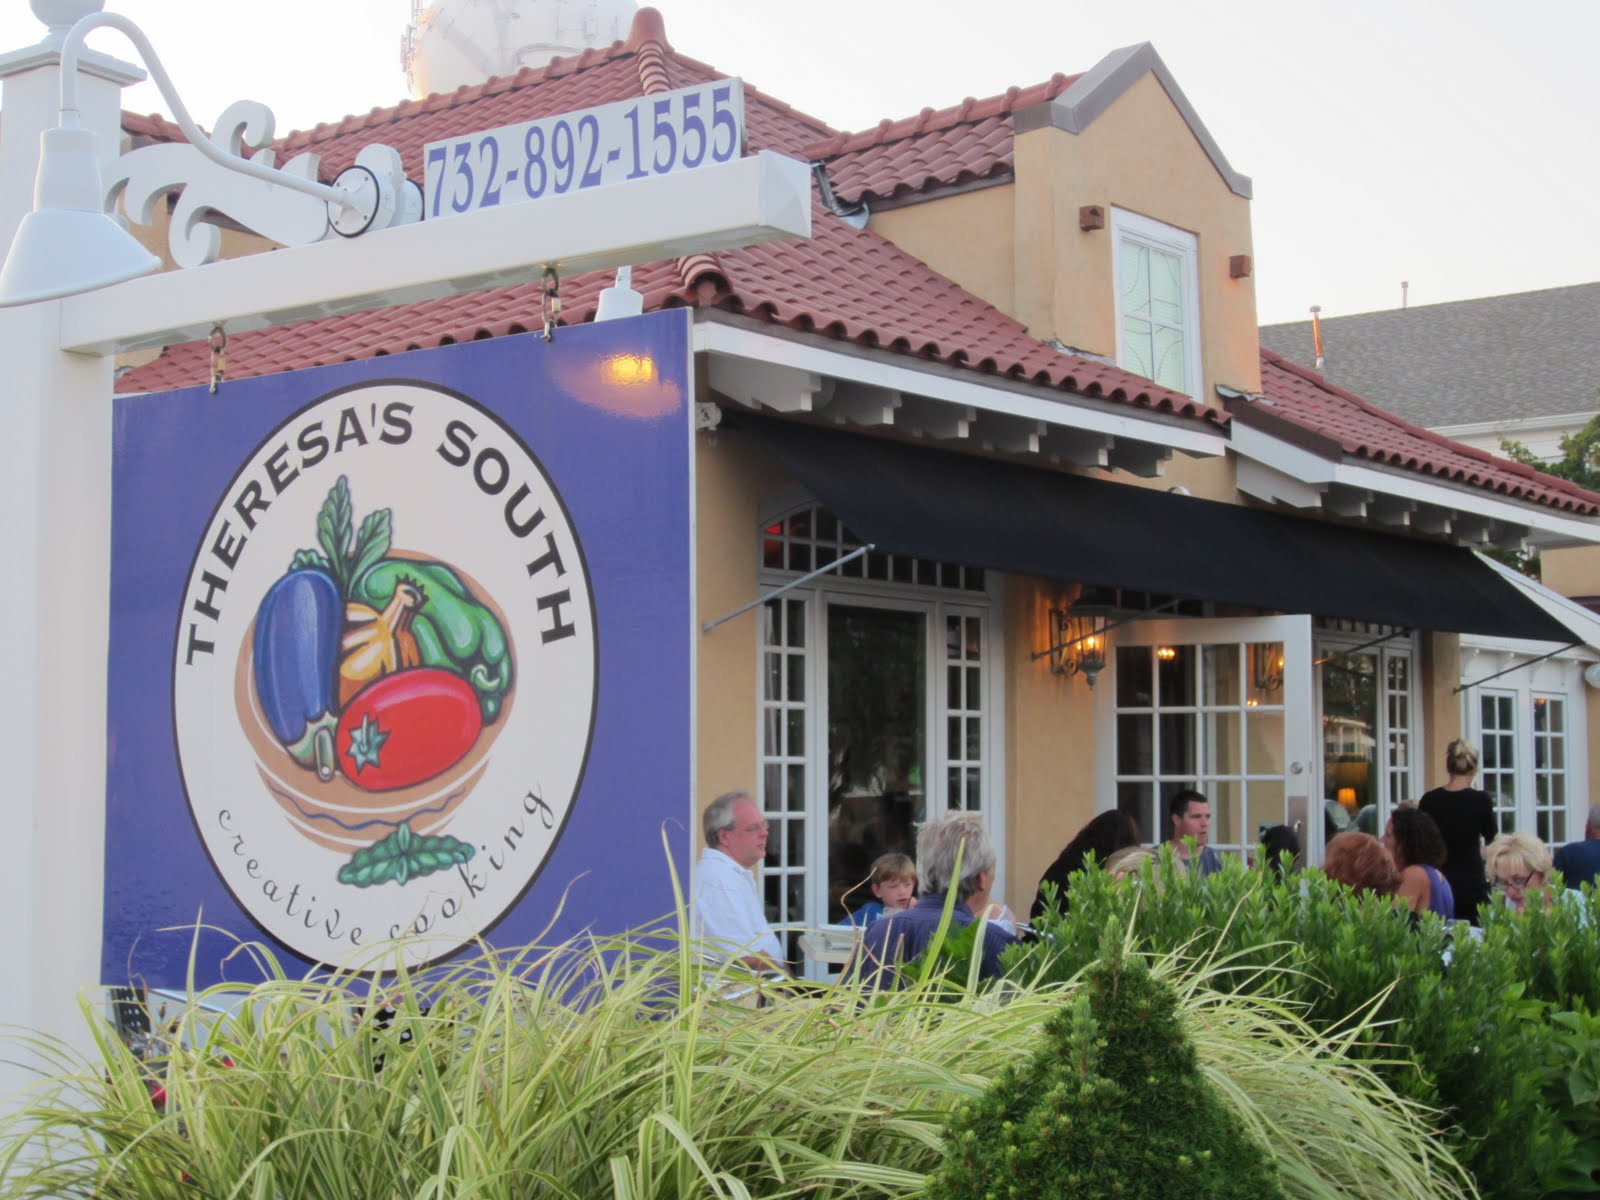 Theresa's South - Bayhead, NJ - One of my favorite restaurants!